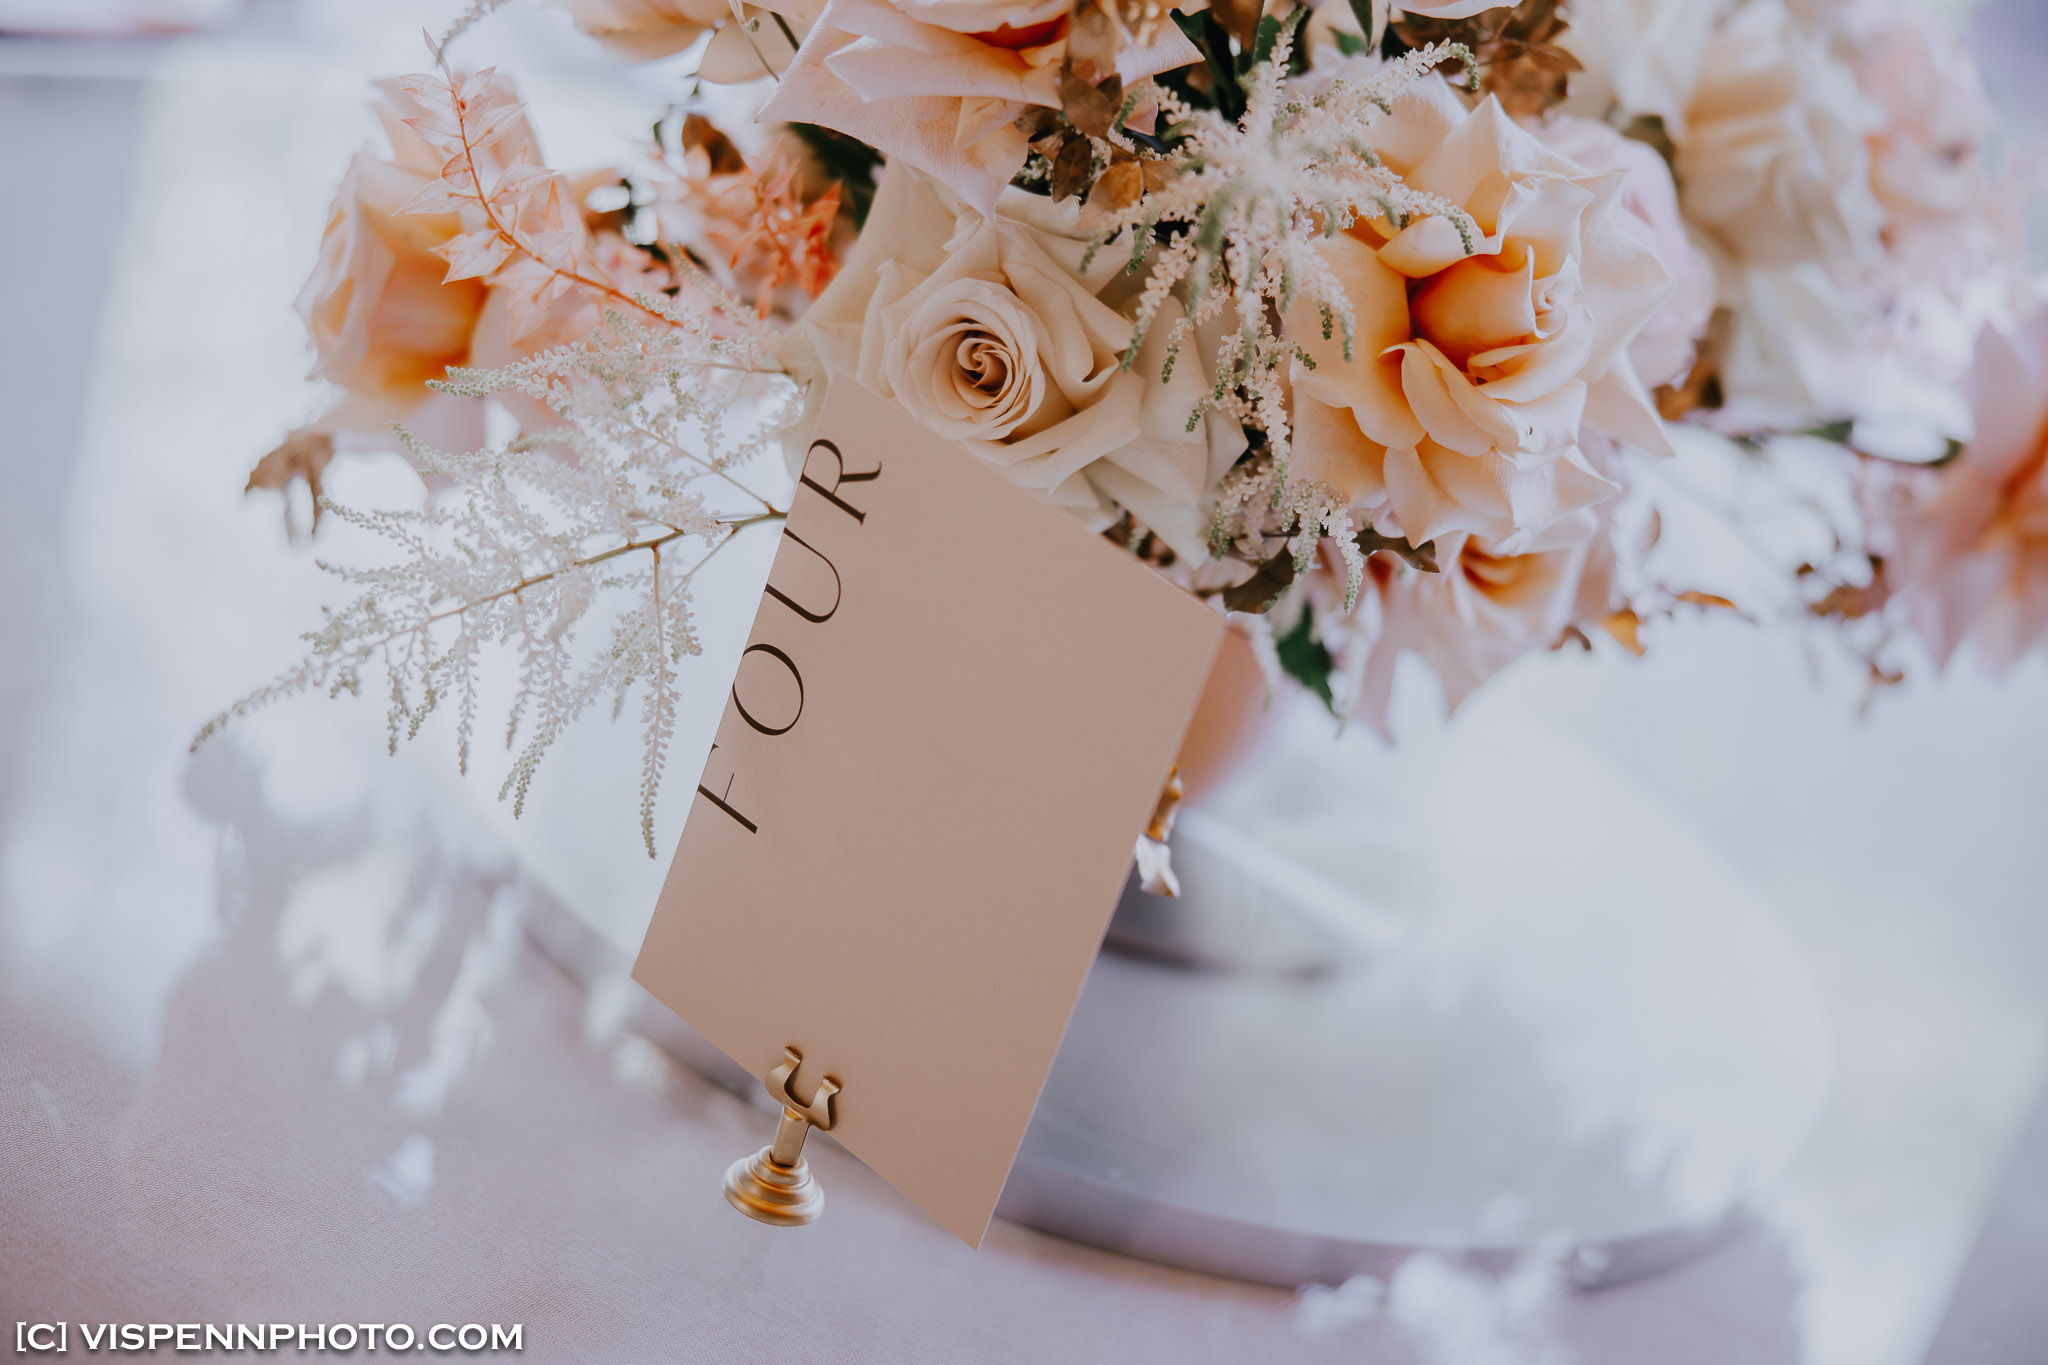 WEDDING DAY Photography Melbourne ElitaPB 07111 1P EOSR ZHPENN